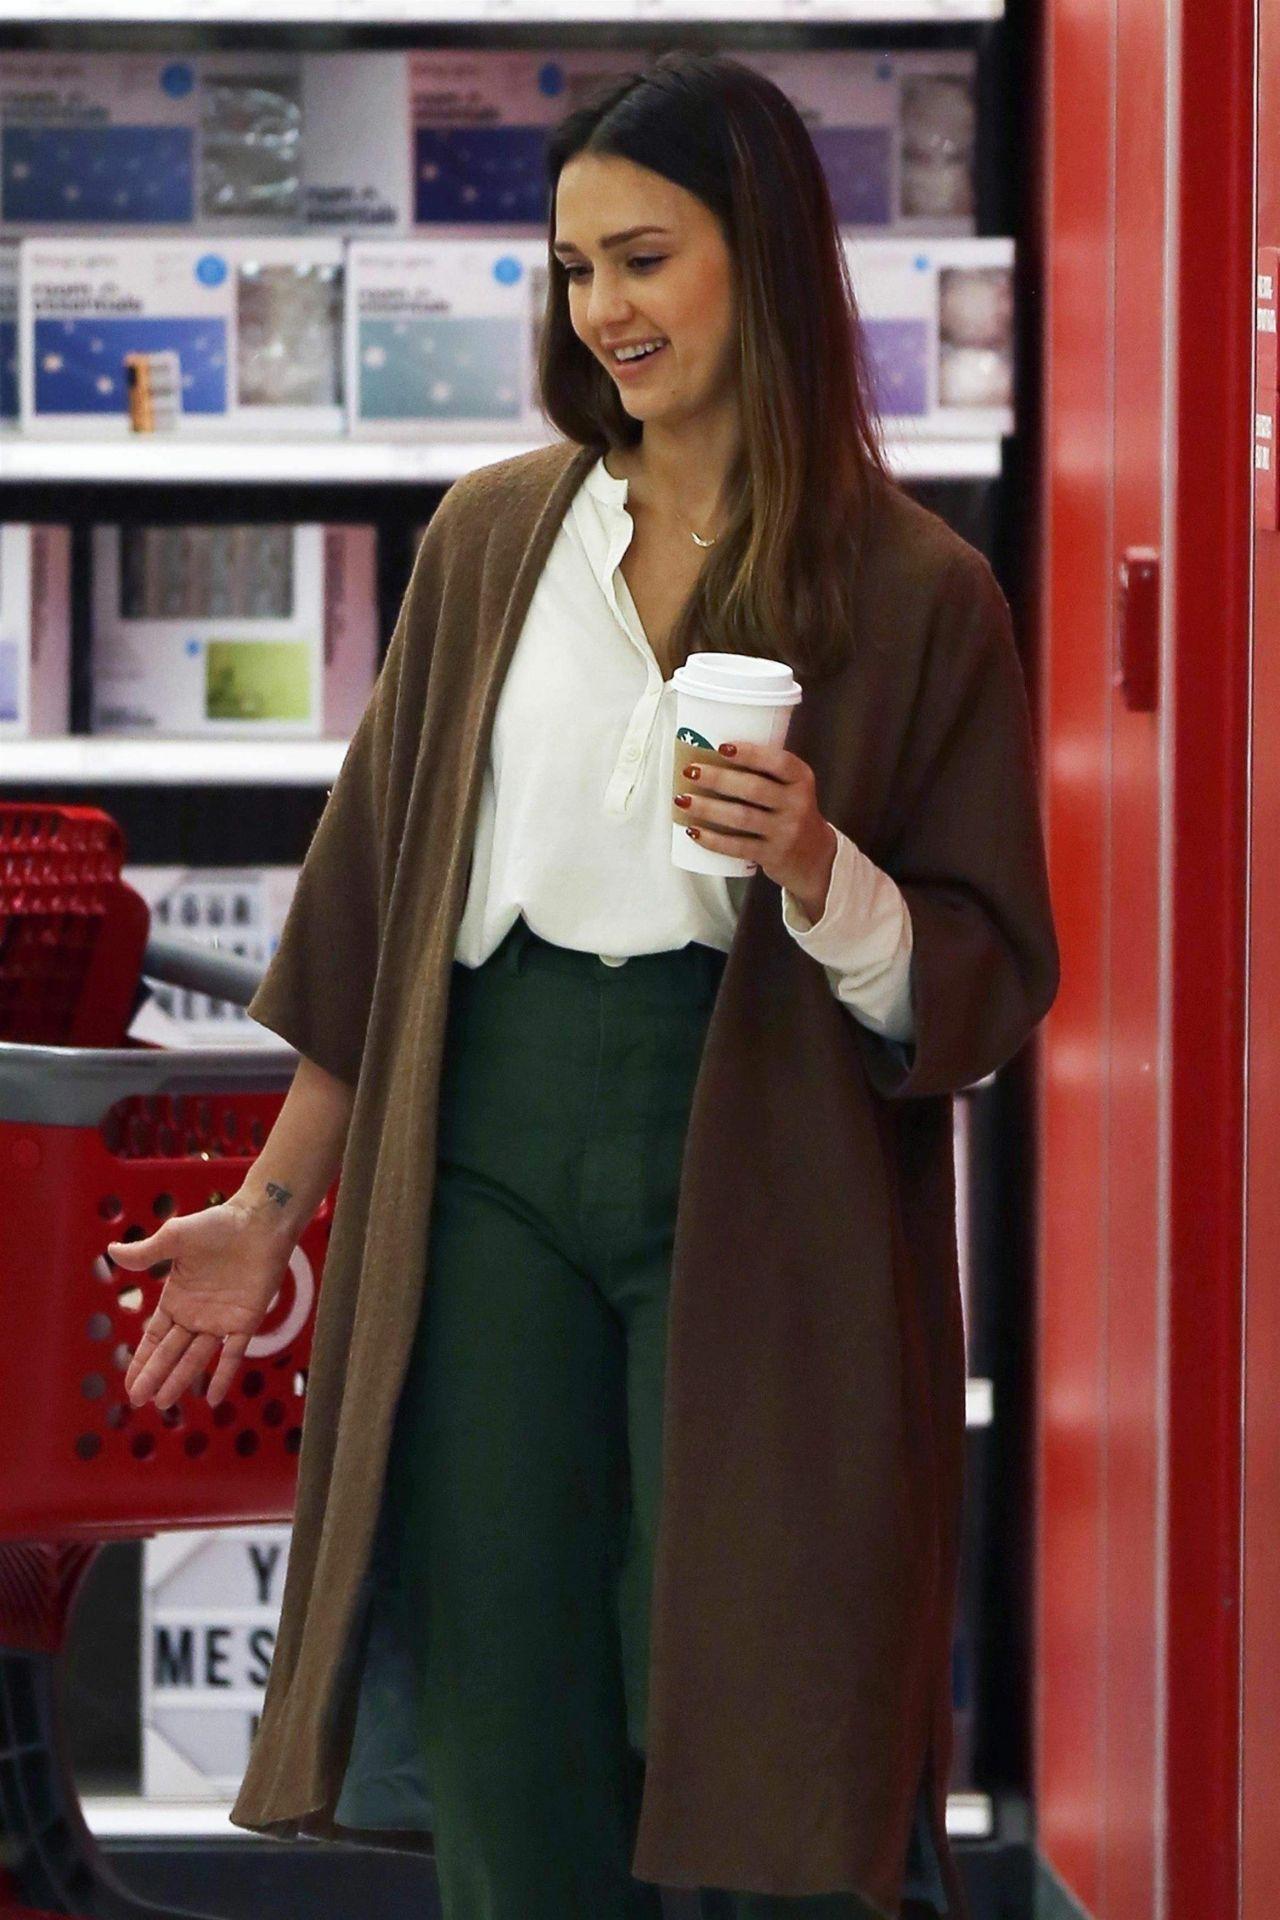 https://celebmafia.com/wp-content/uploads/2018/11/jessica-alba-shopping-at-target-store-in-los-angeles-11-21-2018-1.jpg